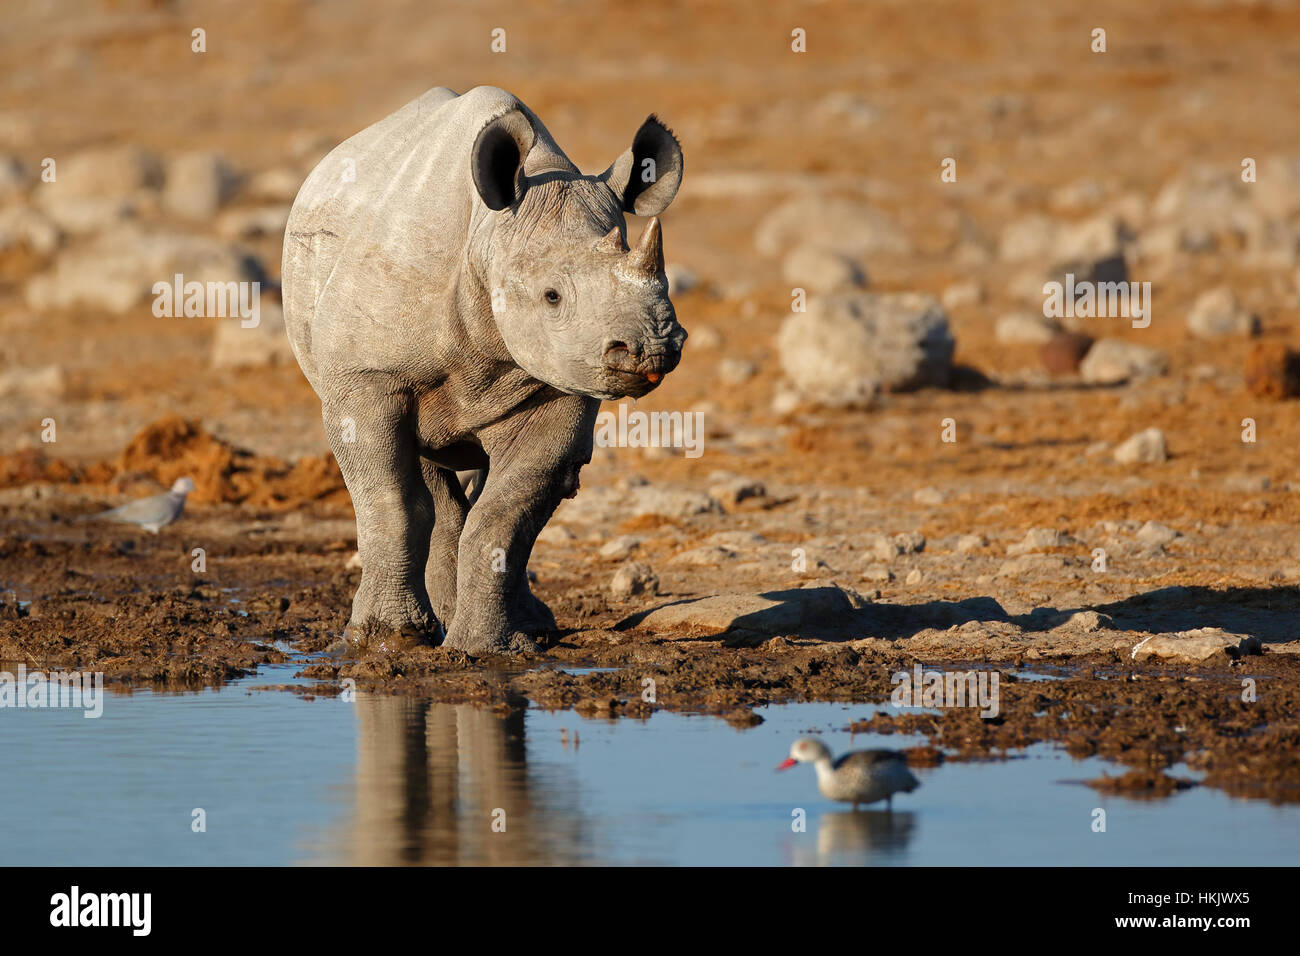 Un rhinocéros noir (Diceros bicornis) à un étang, Etosha National Park, Namibie Photo Stock